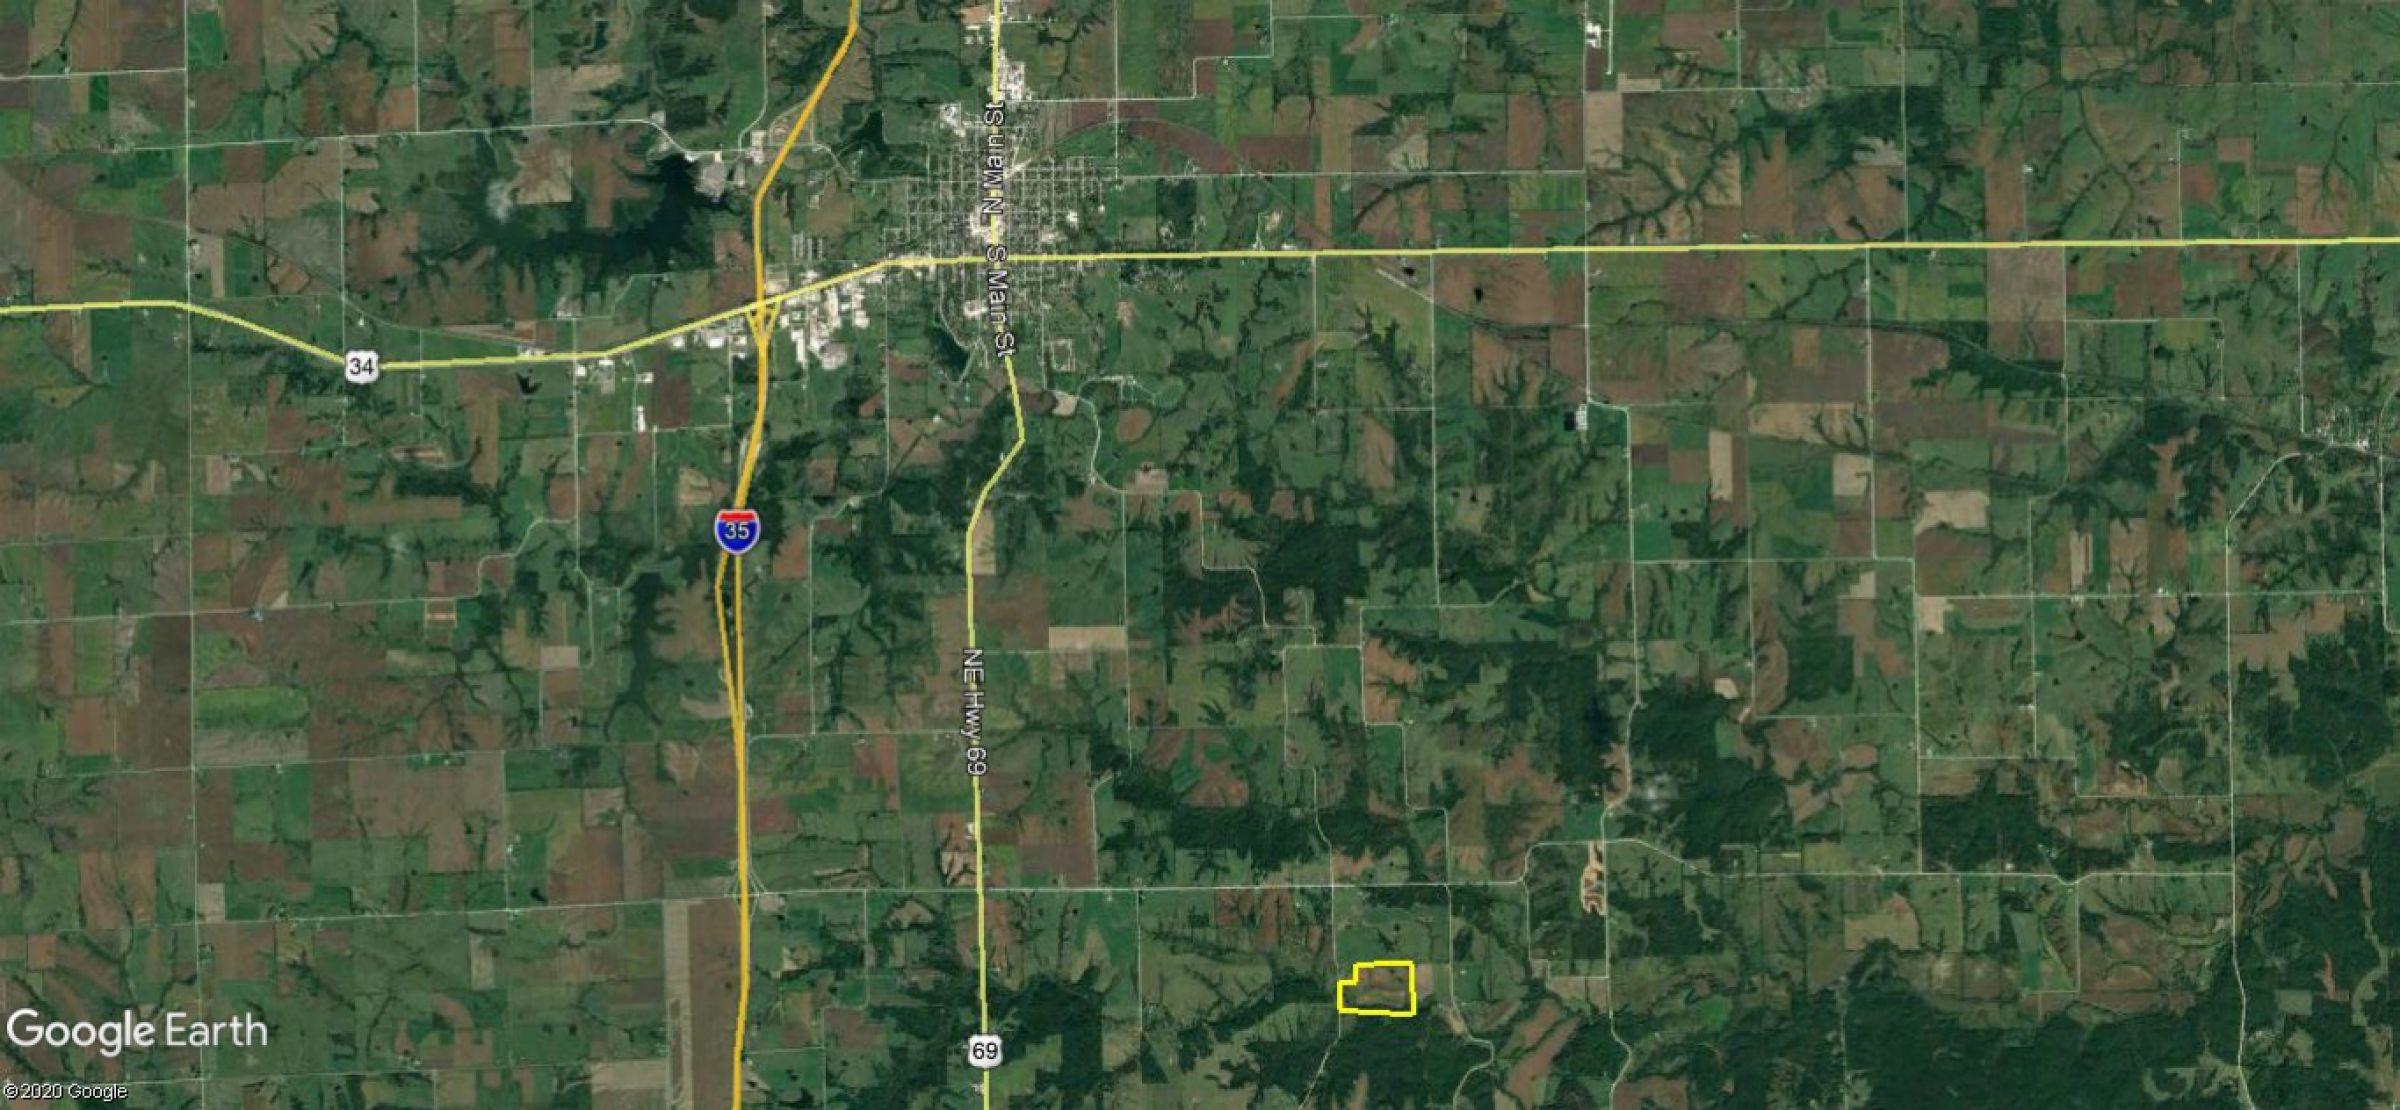 land-clarke-county-iowa-86-acres-listing-number-15147-1-2020-08-28-194147.jpg